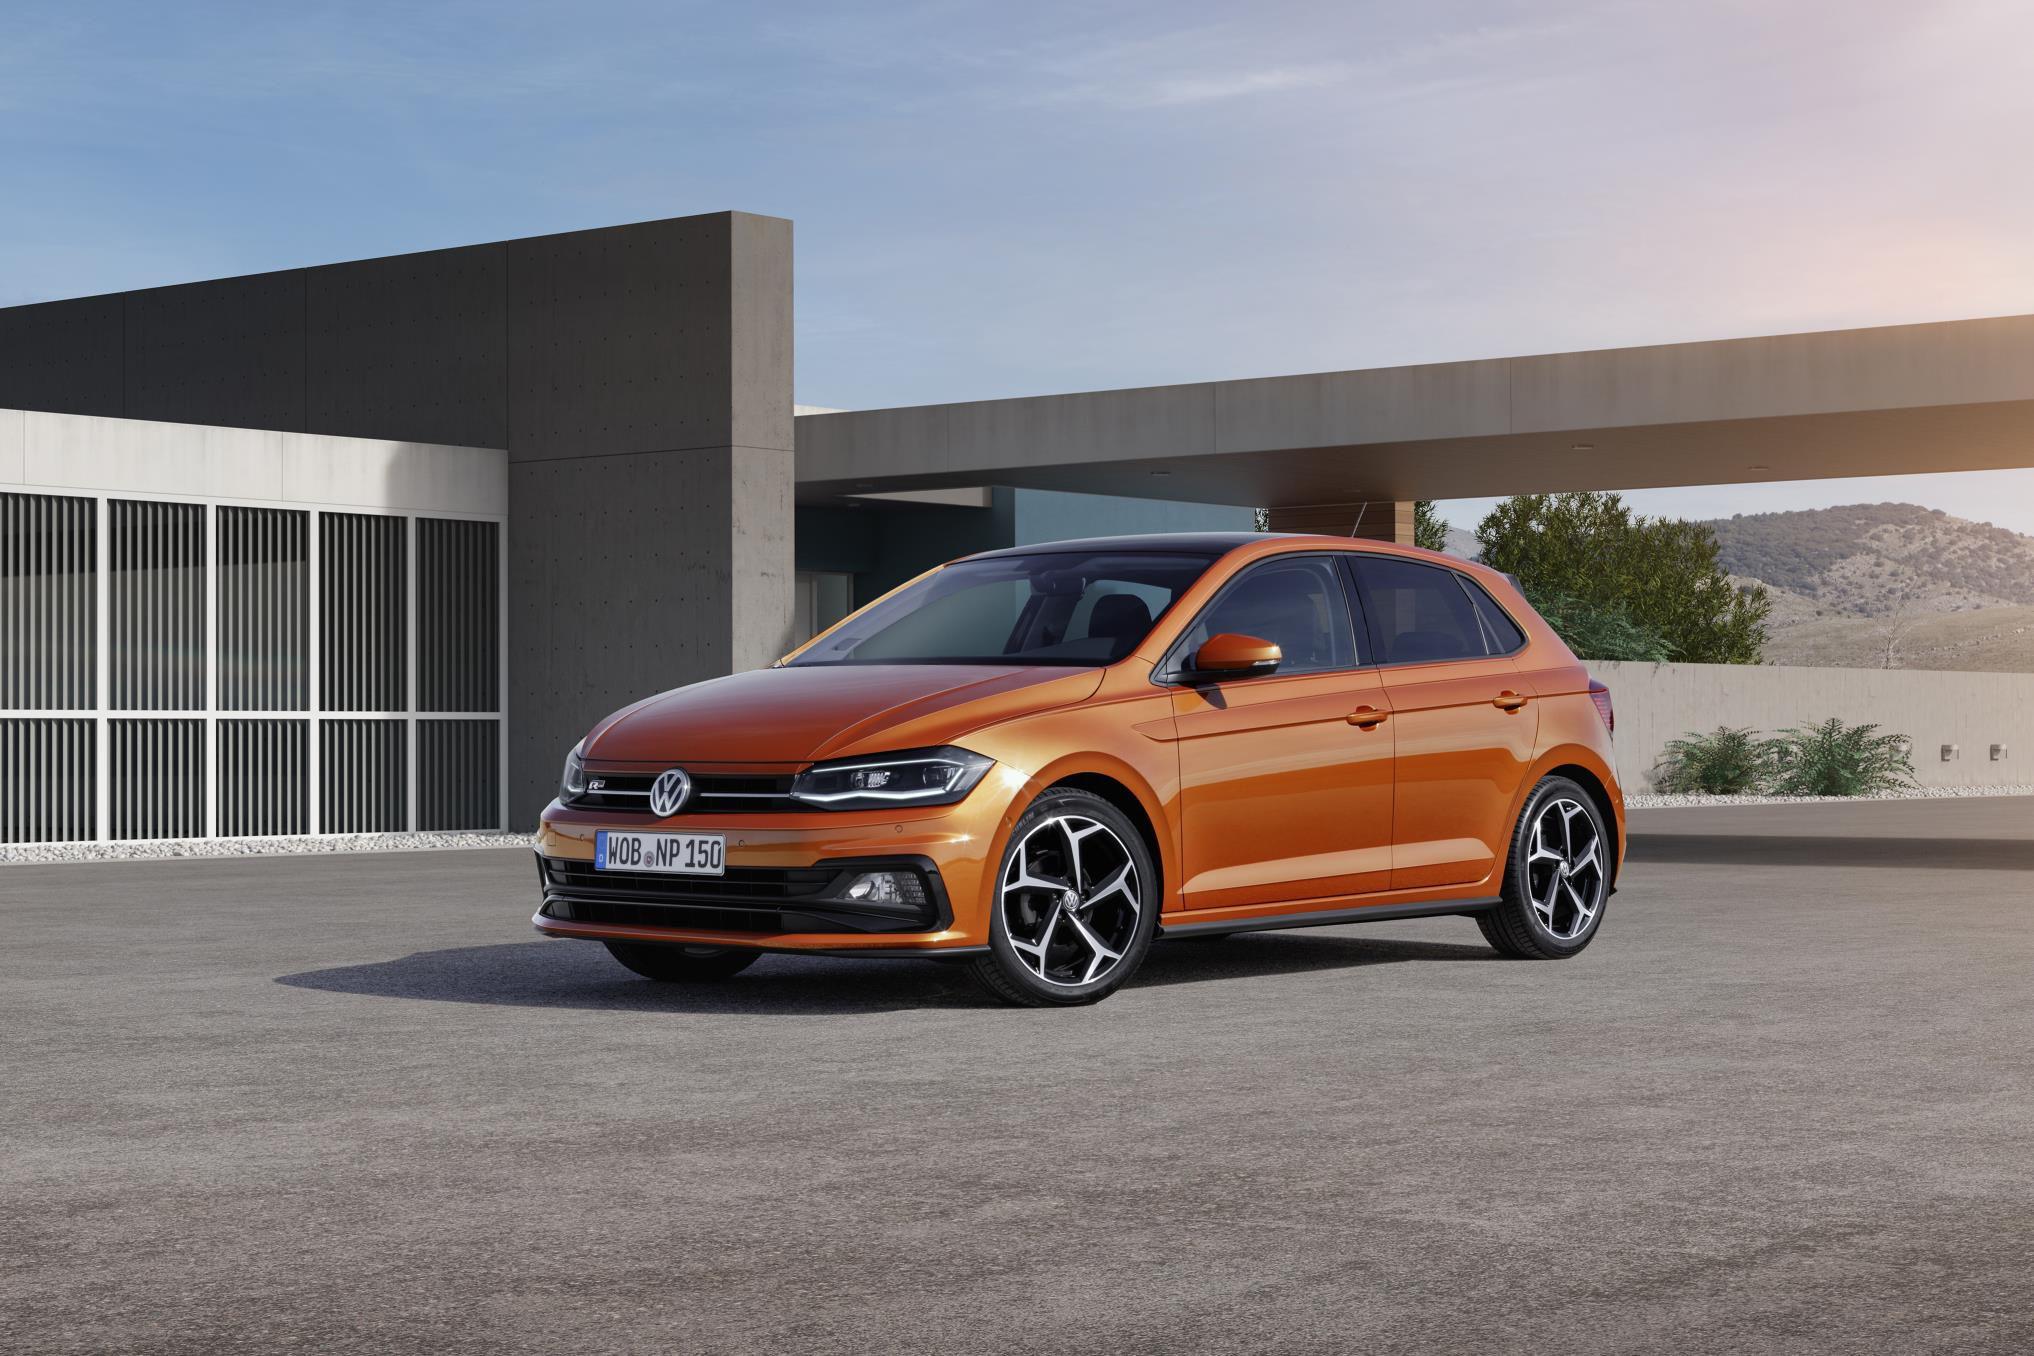 Orange new VW Polo R-Line parked by a concrete building